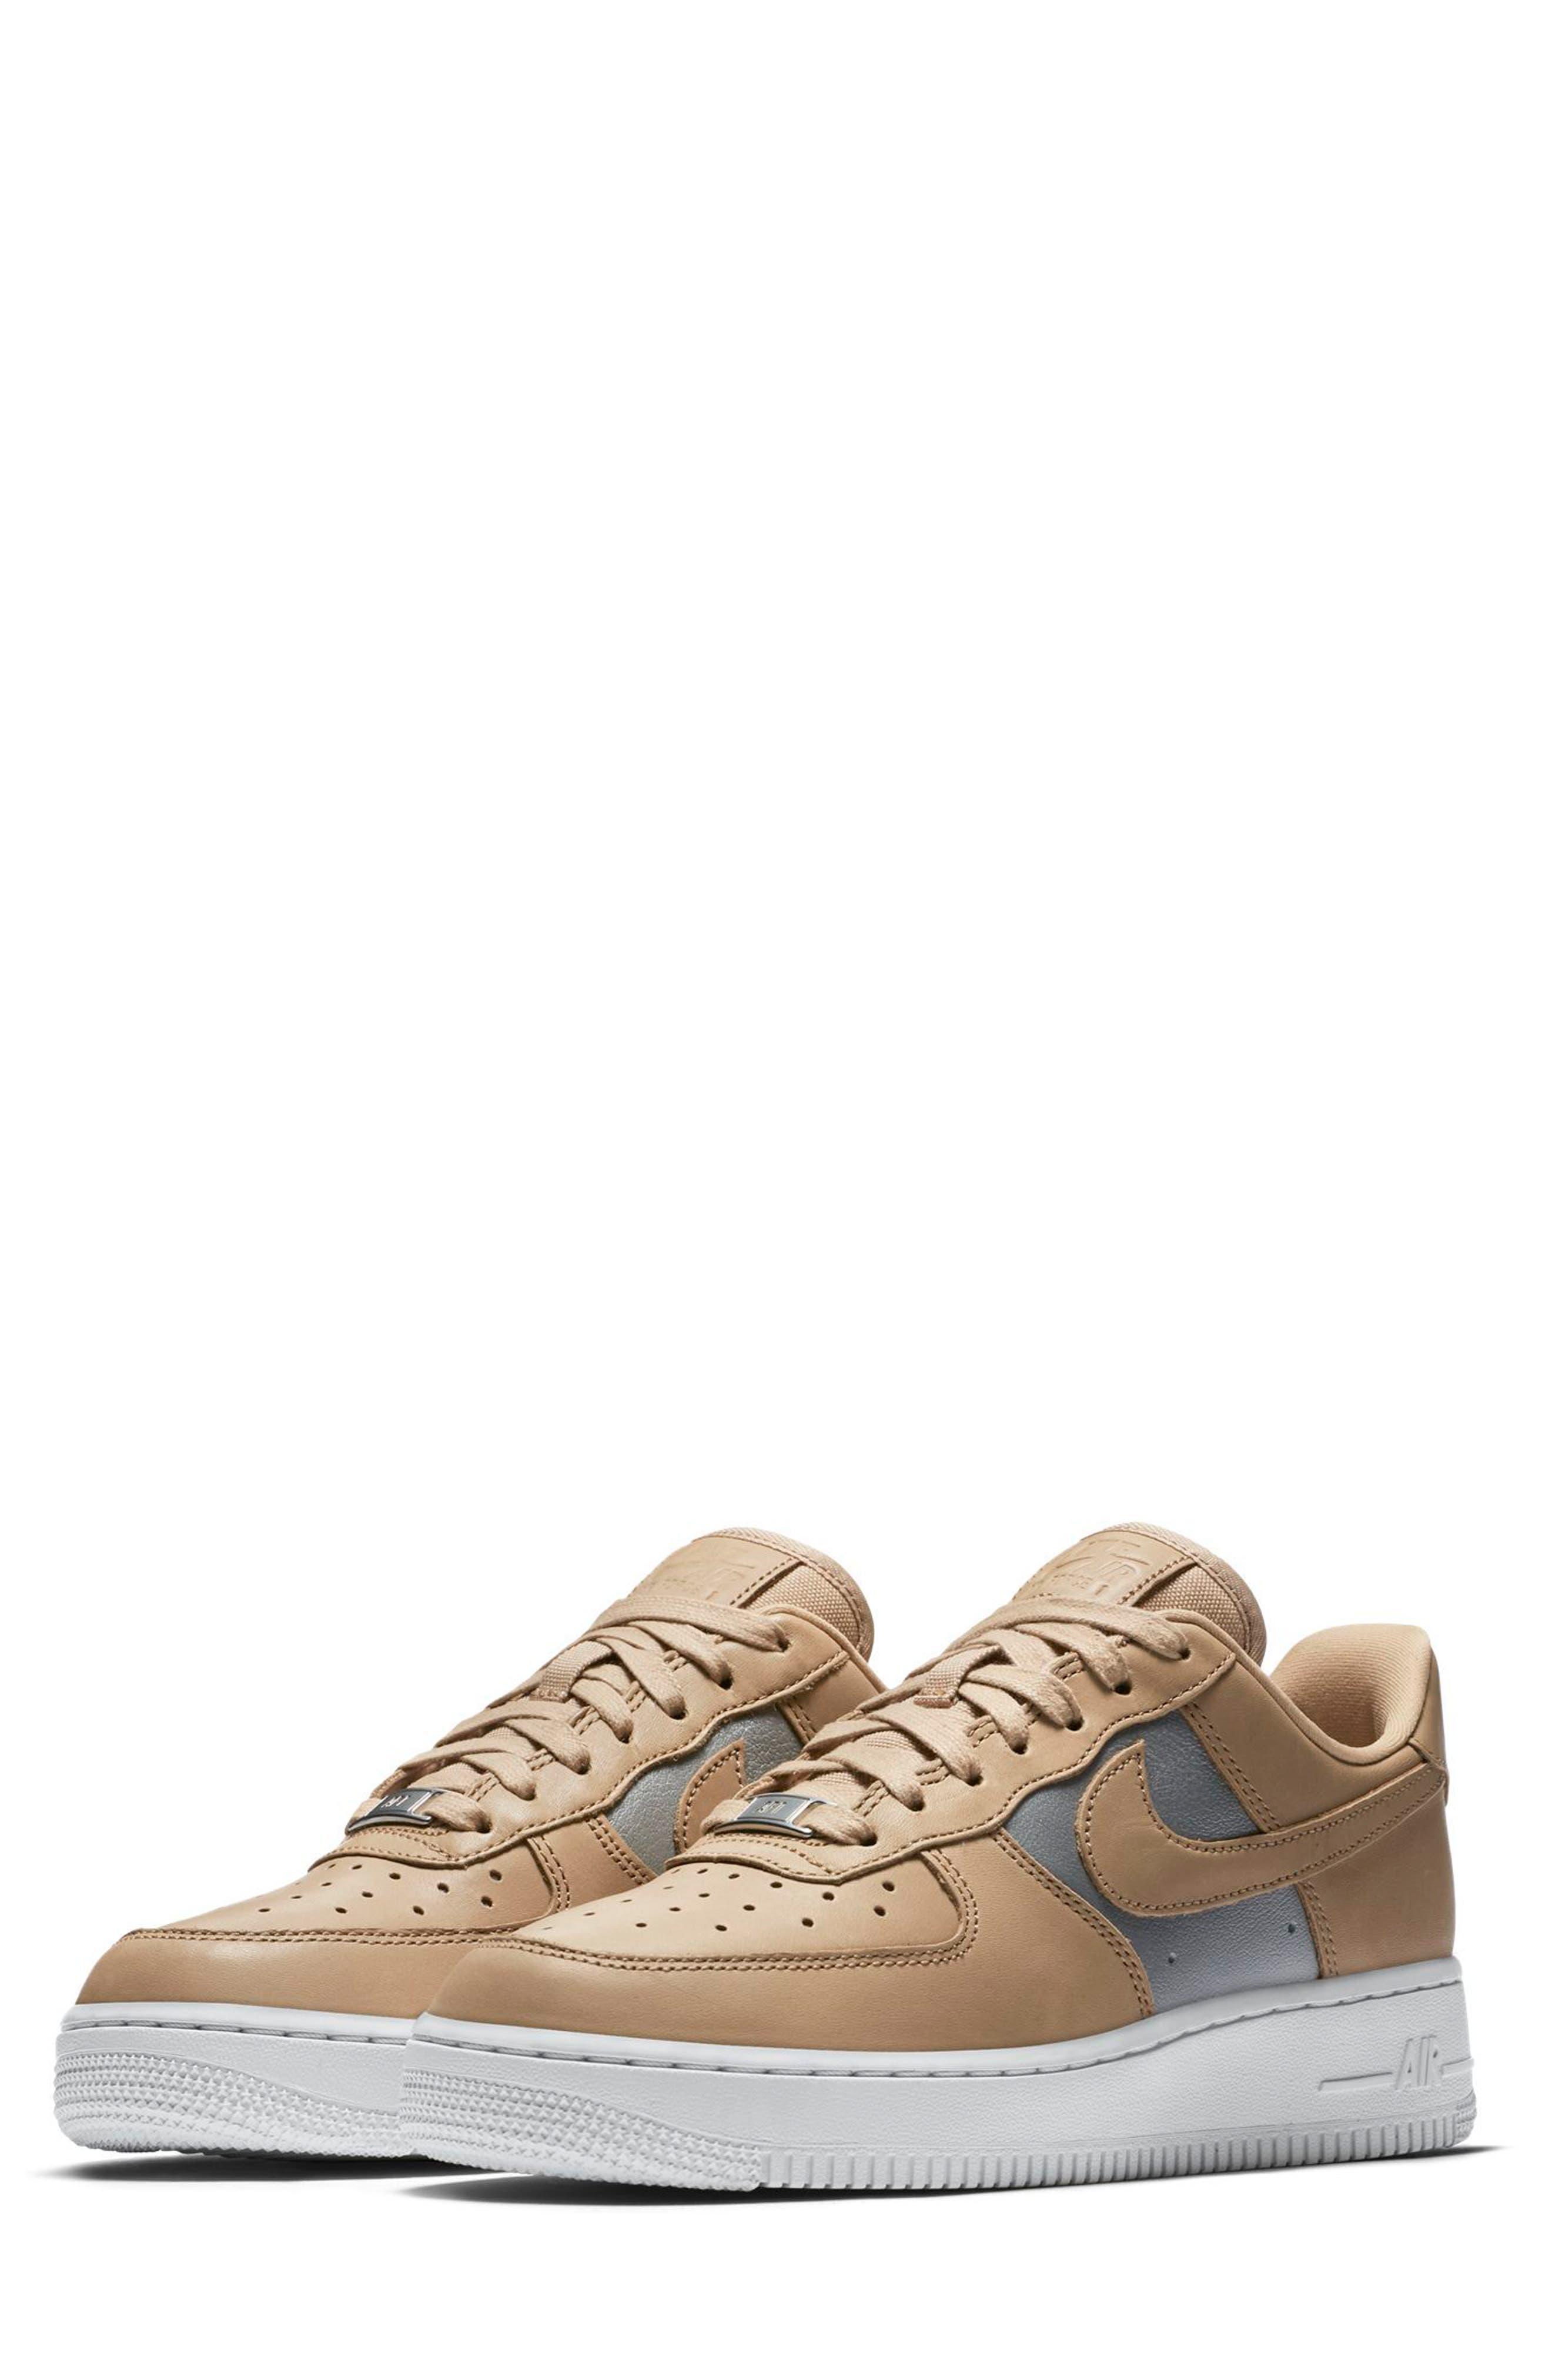 Air Force 1 '07 SE Premium Sneaker,                         Main,                         color, Beige/ Silver/ White